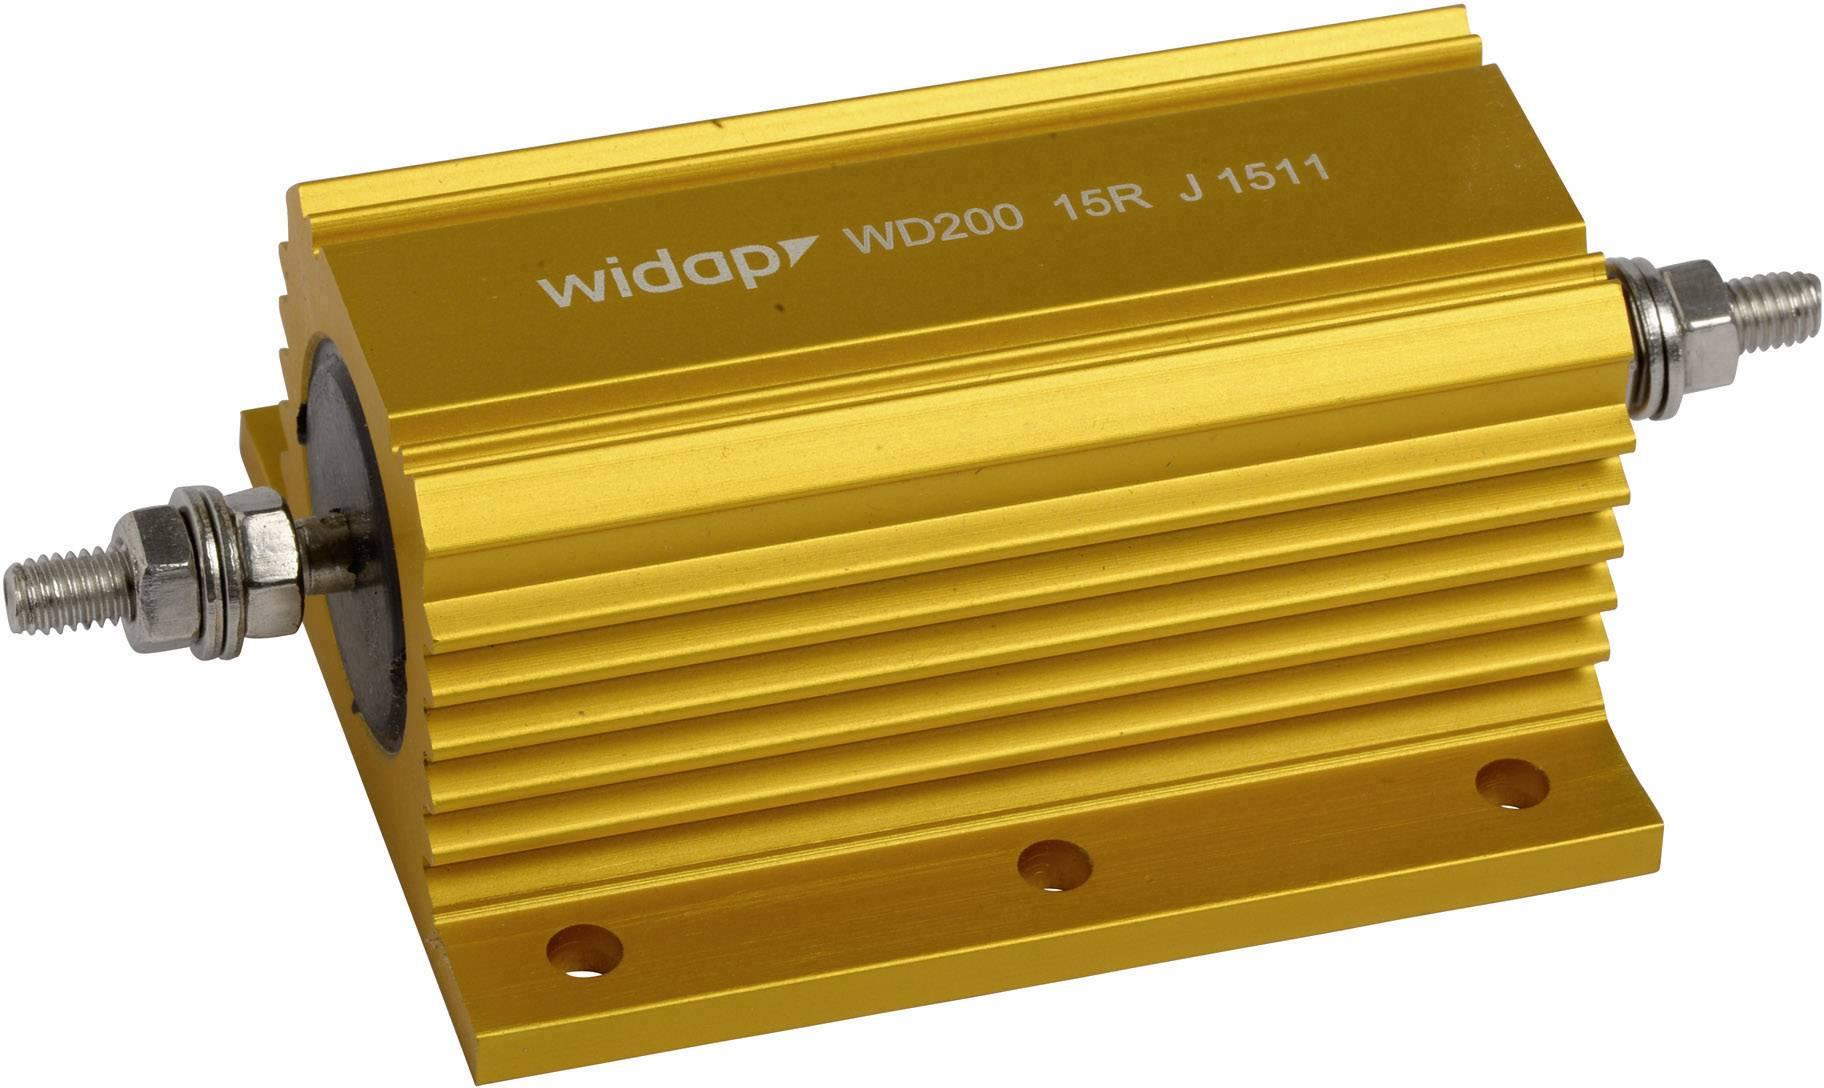 Drôtový rezistor Widap 160147, hodnota odporu 3.3 Ohm, 200 W, 1 ks